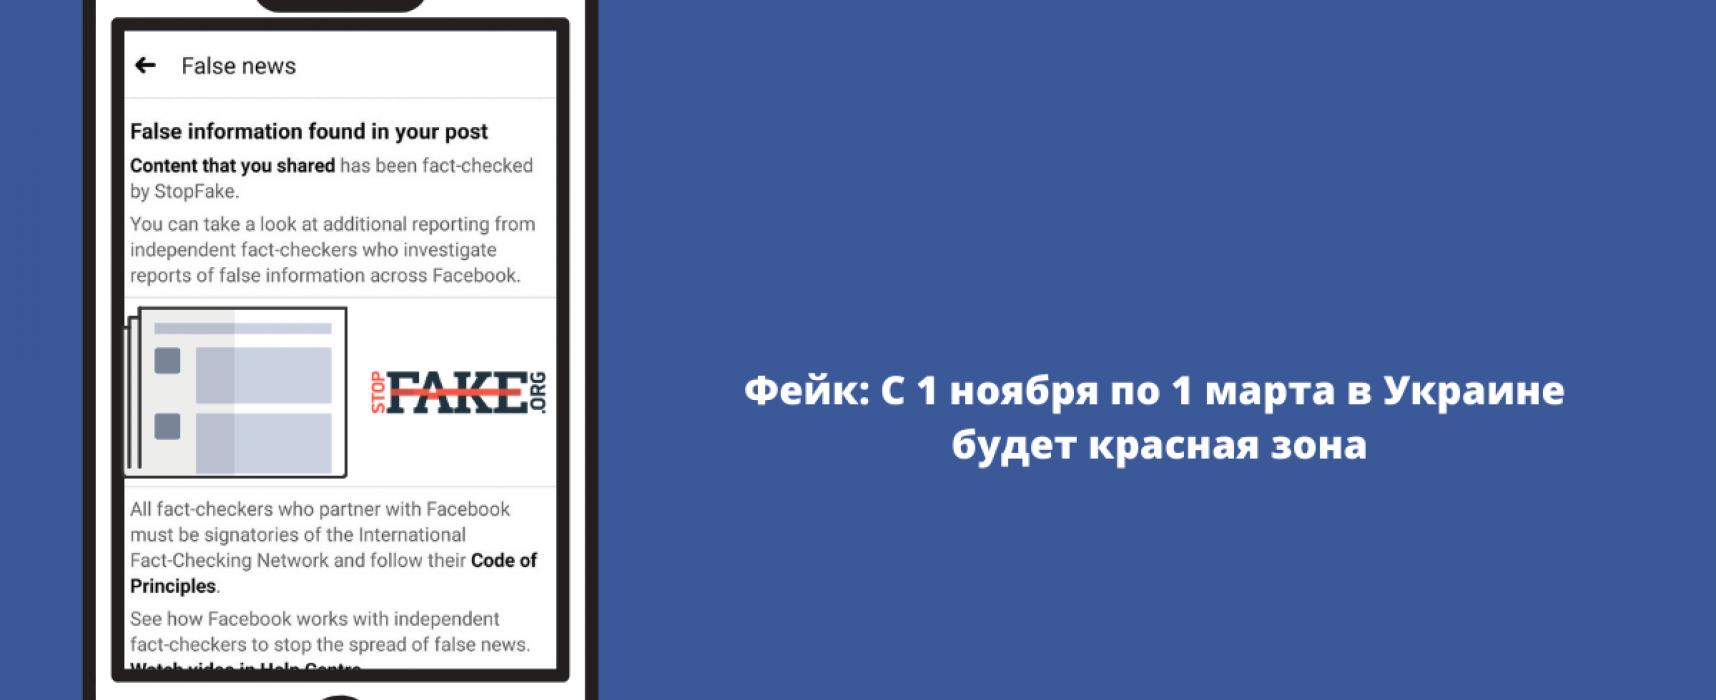 Фейк: З 1 листопада по 1 березня в Україні буде червона зона